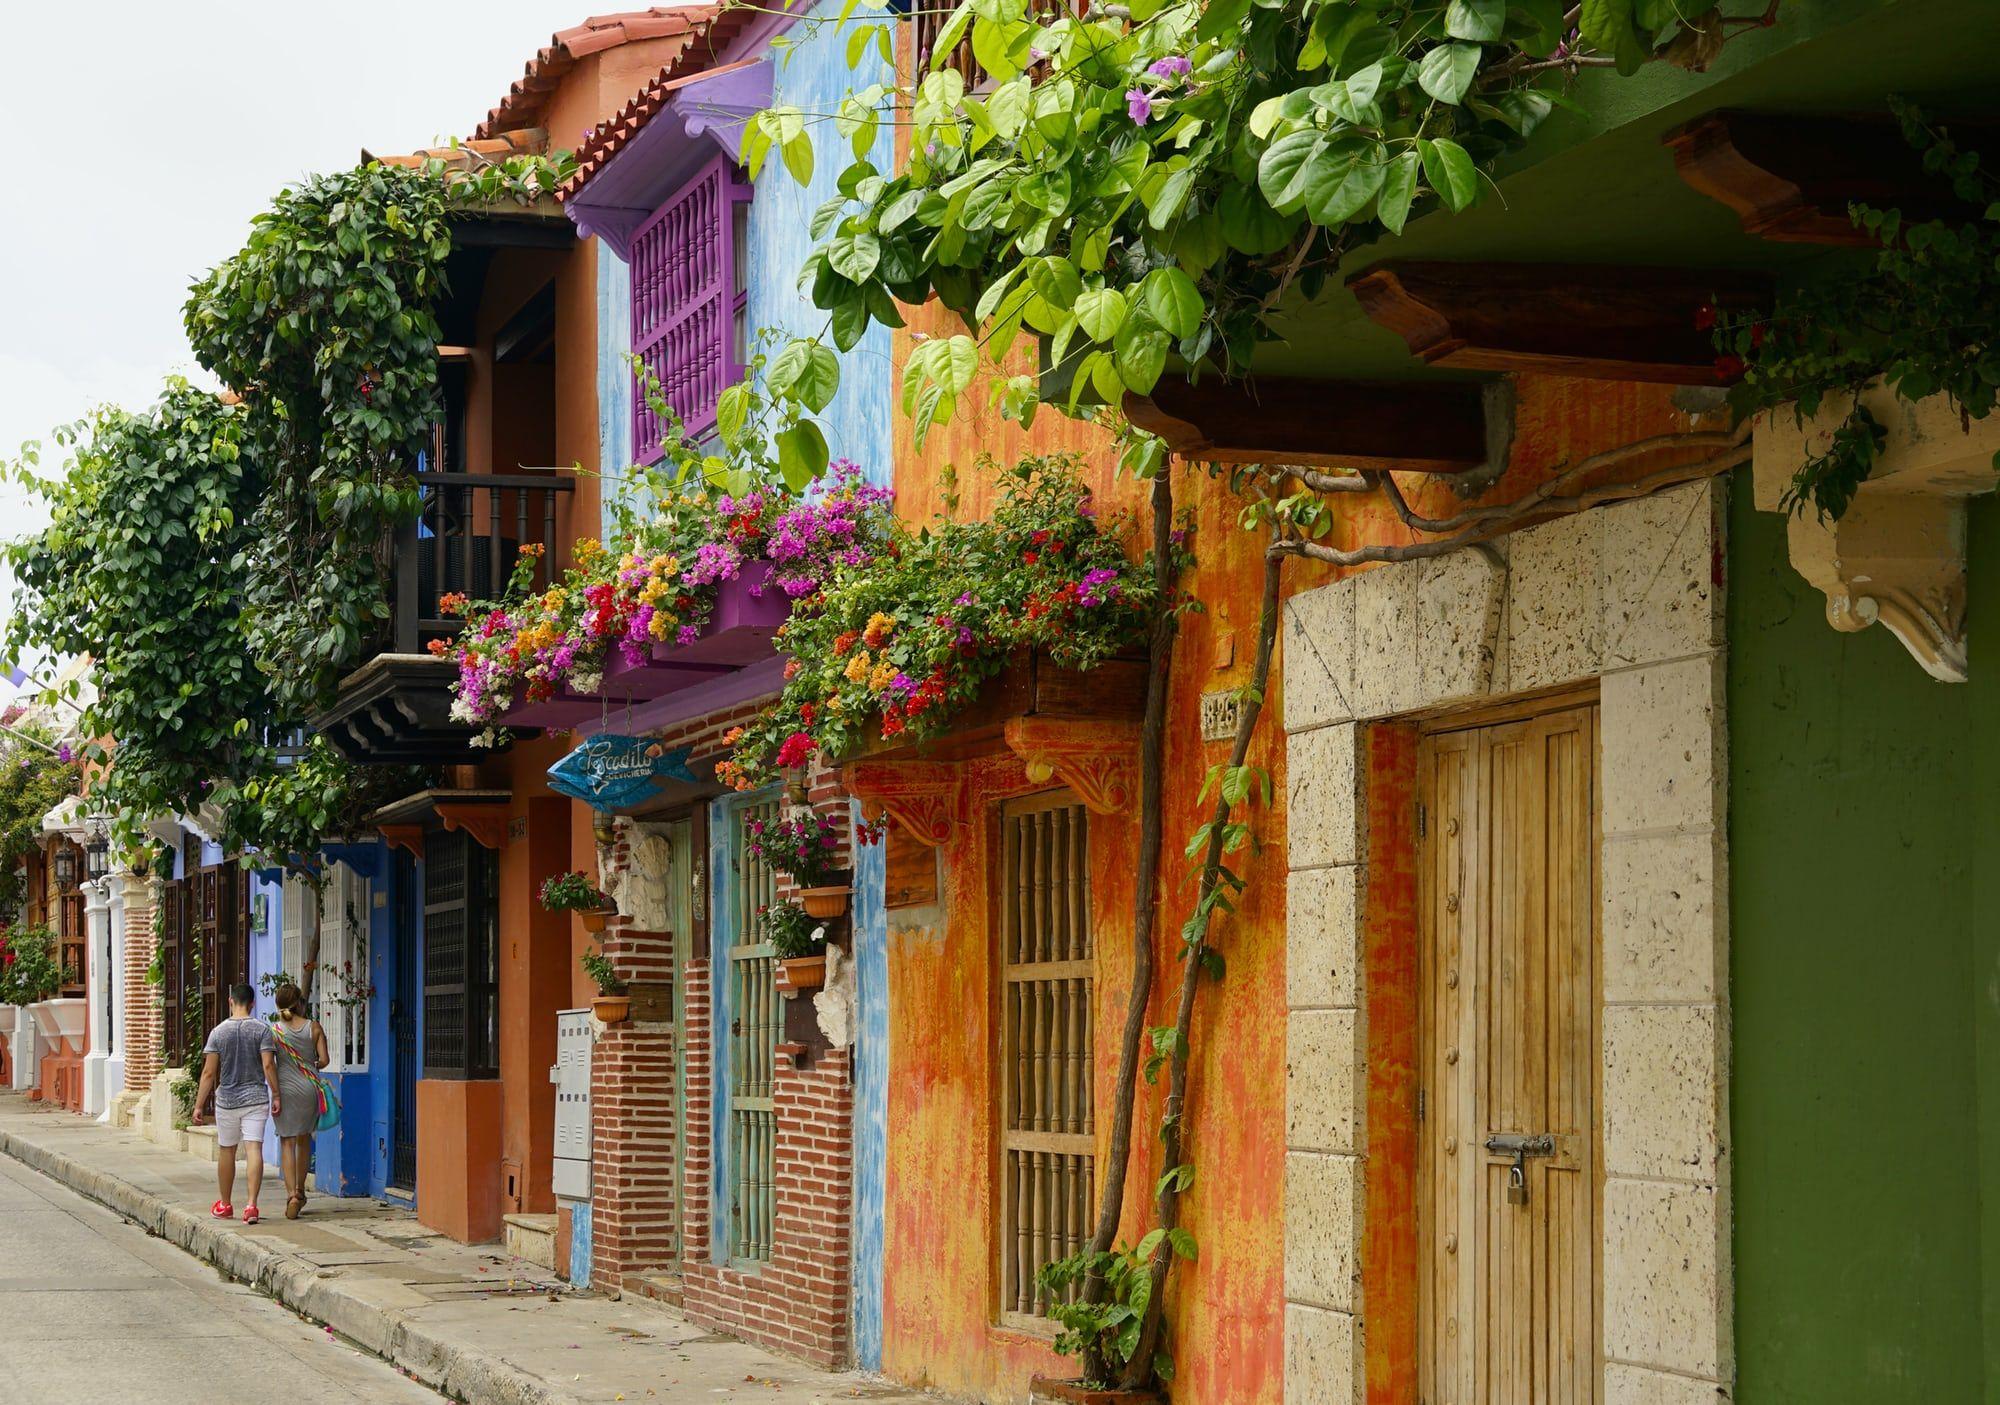 Thanks To Ricardo Gomez Angel For Making This Photo Available Freely On Unsplash Unique Destination Cartagena De Indias Cartagena